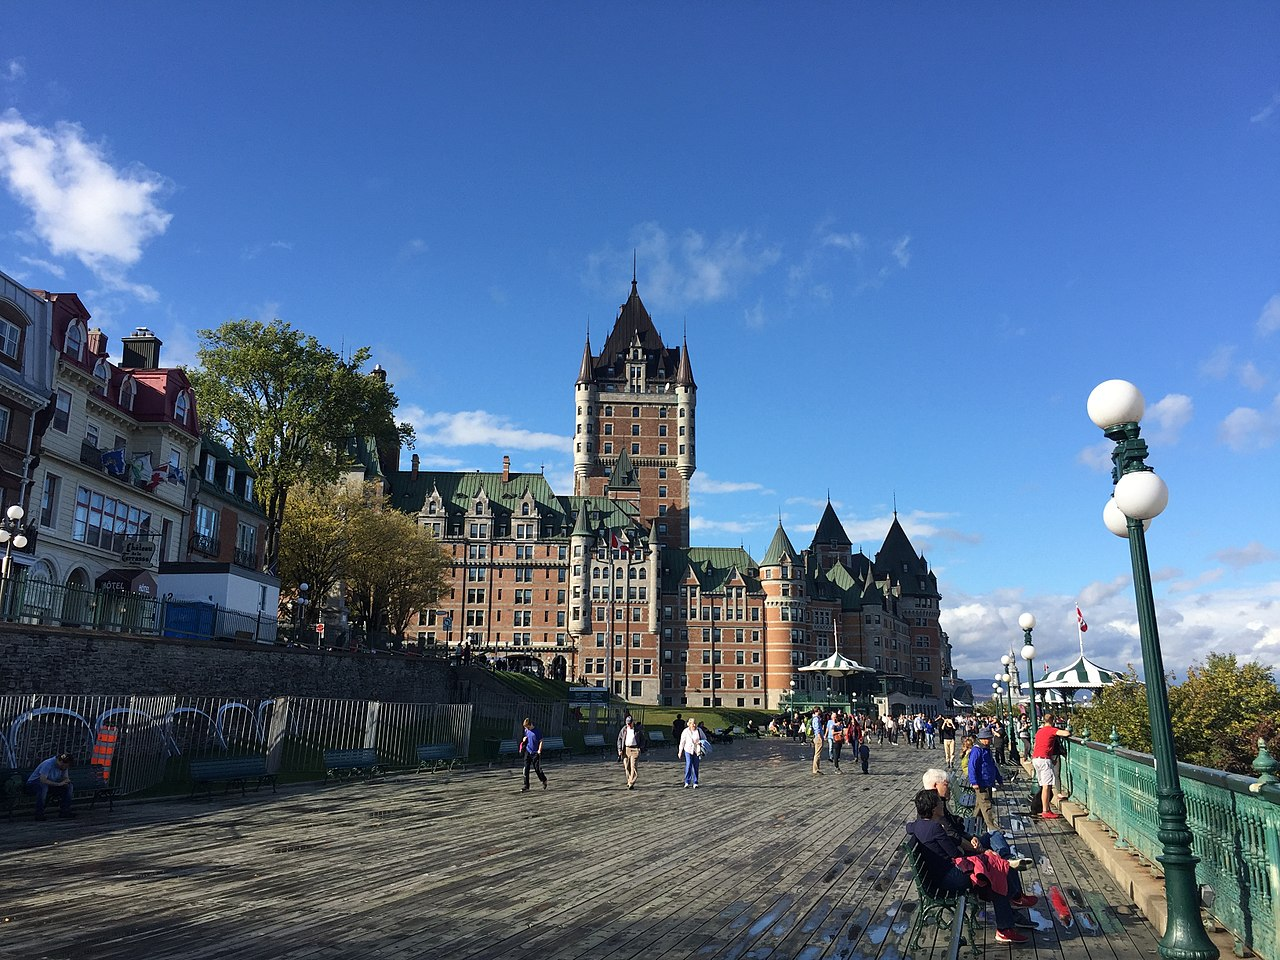 File:Quebec City, Quebec Canada.jpg - Wikimedia Commons